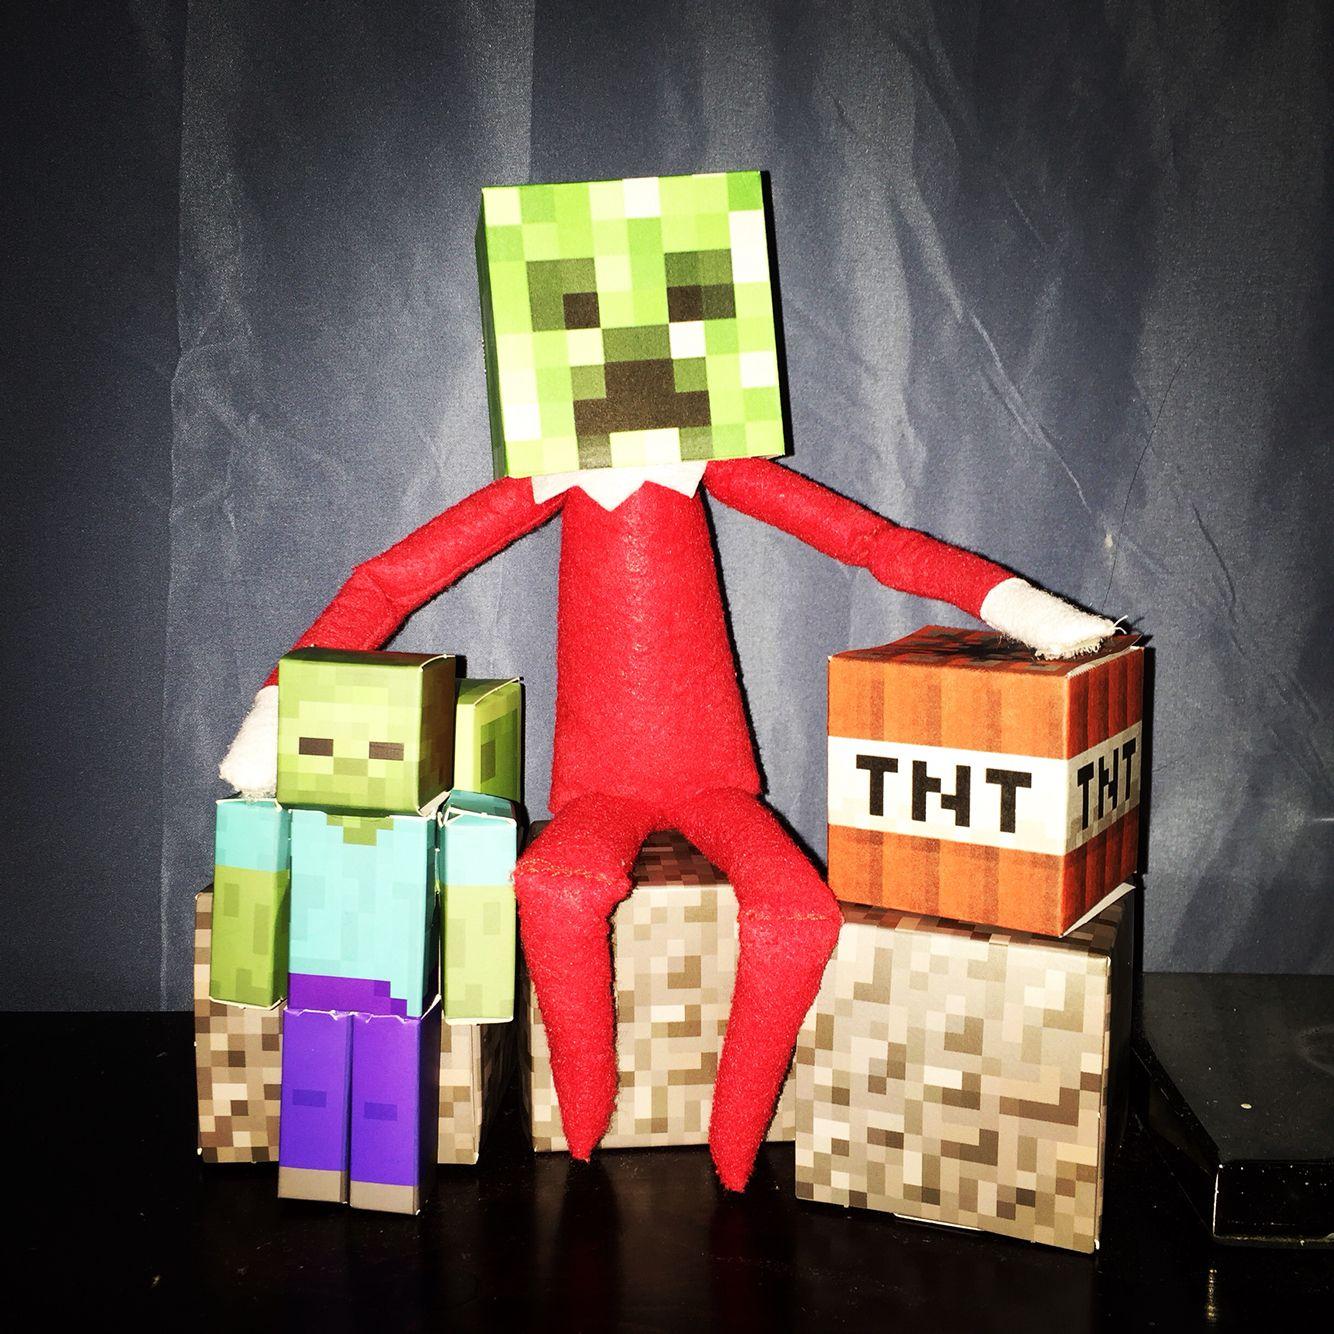 Elf on the Shelf Day 4 Minecraft style! kippertheelf